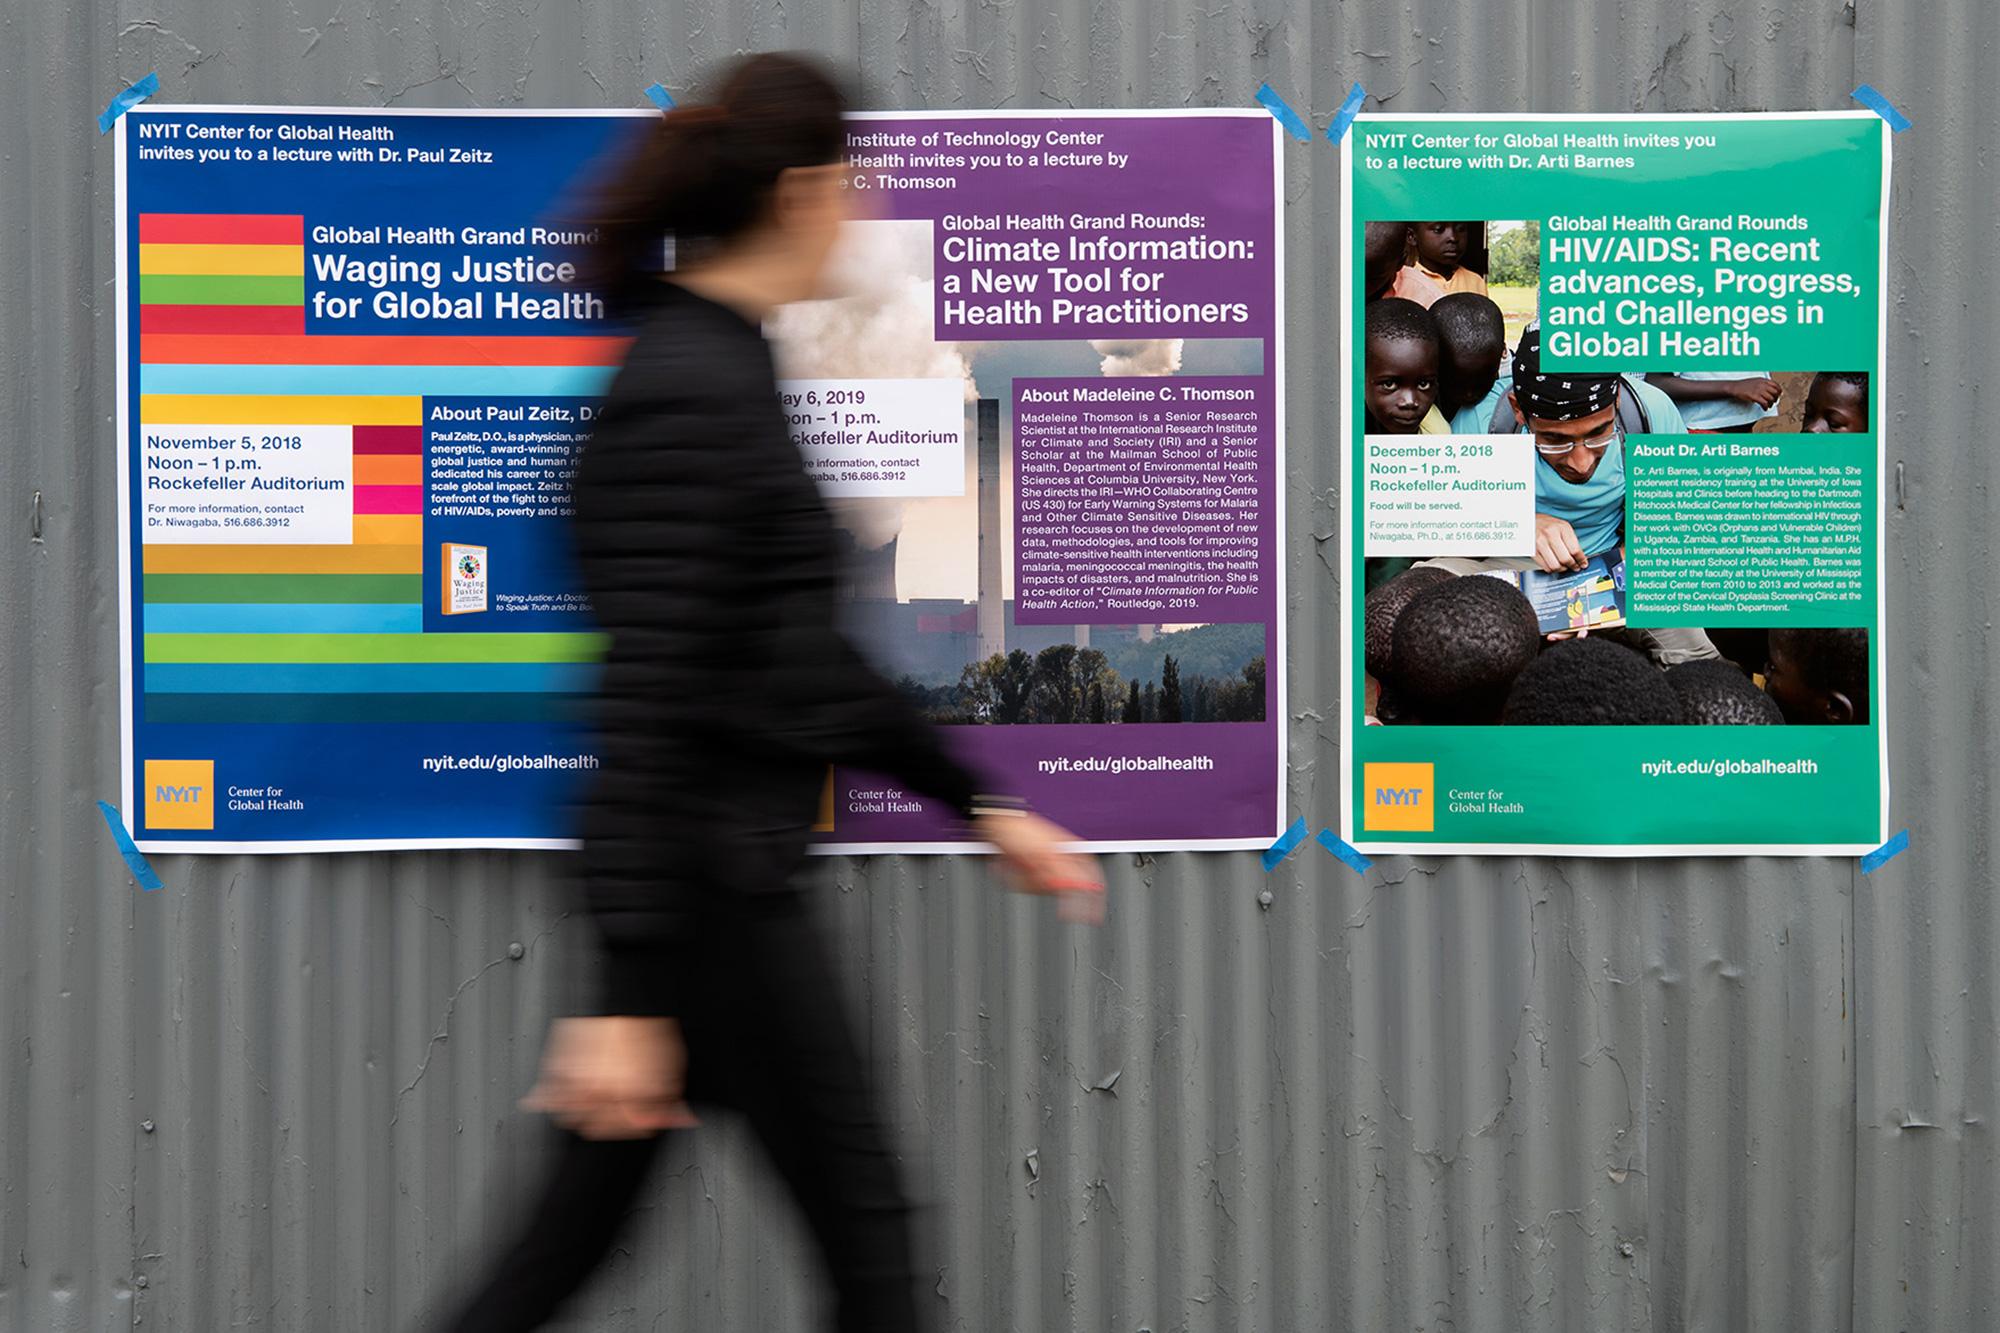 Global_Health_Challenges_Poster_4.jpg